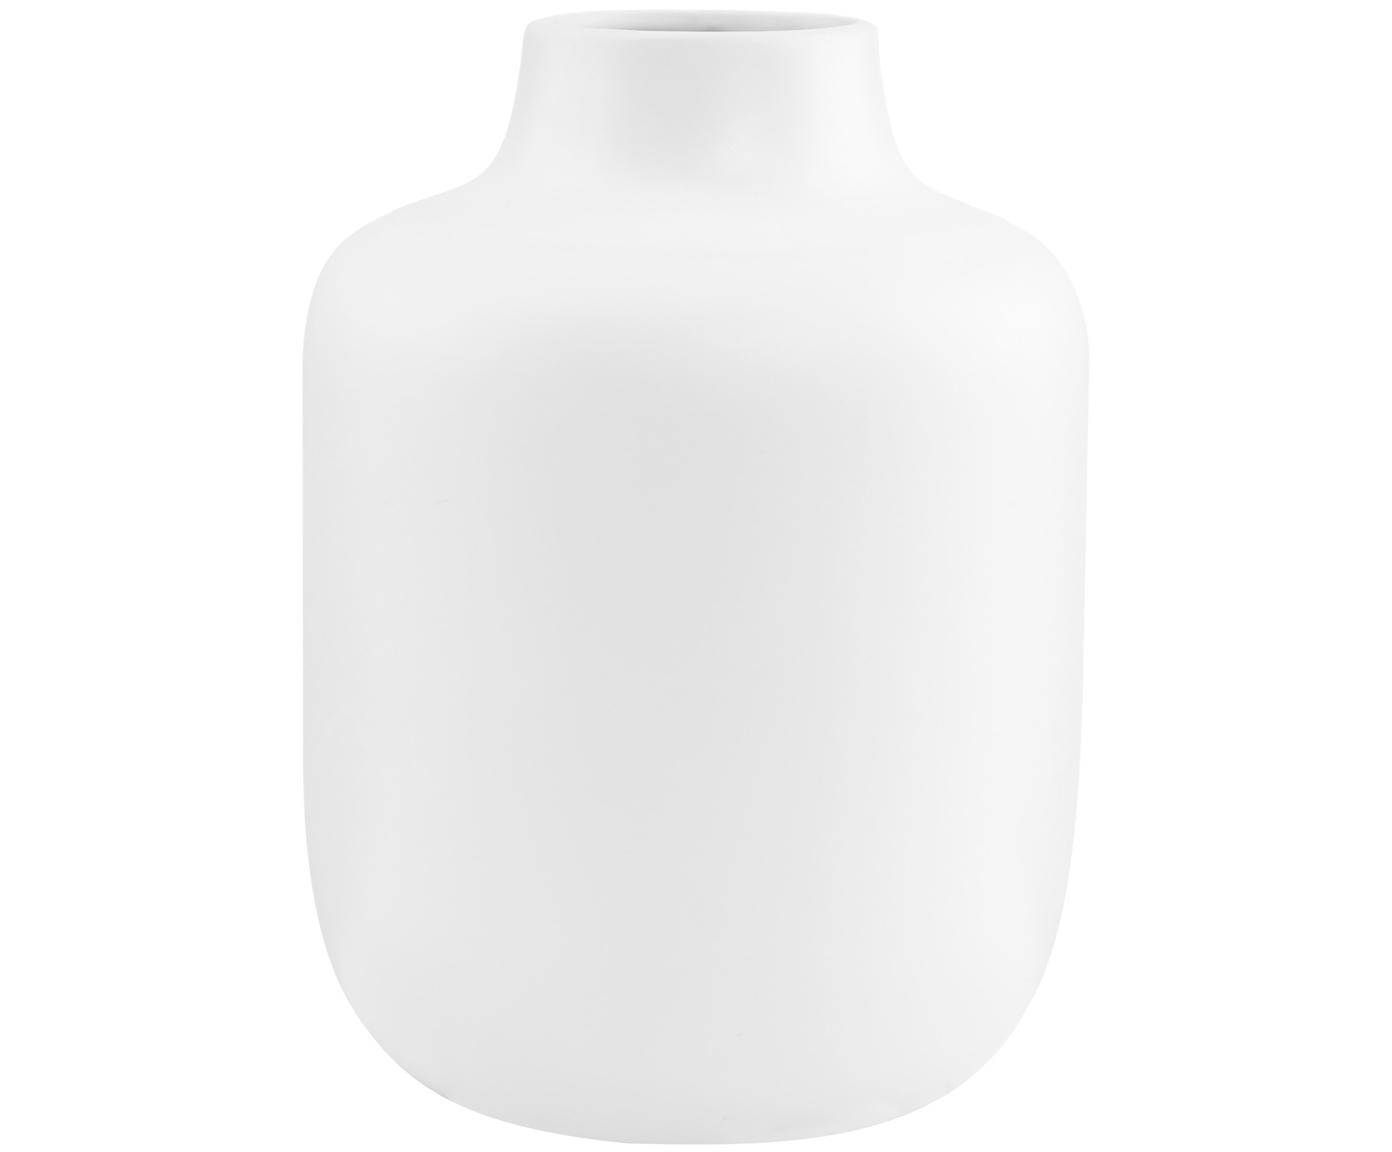 Jarrón de porcelana Belle Blanc, Porcelana, Blanco, Ø 17 x Al 20 cm